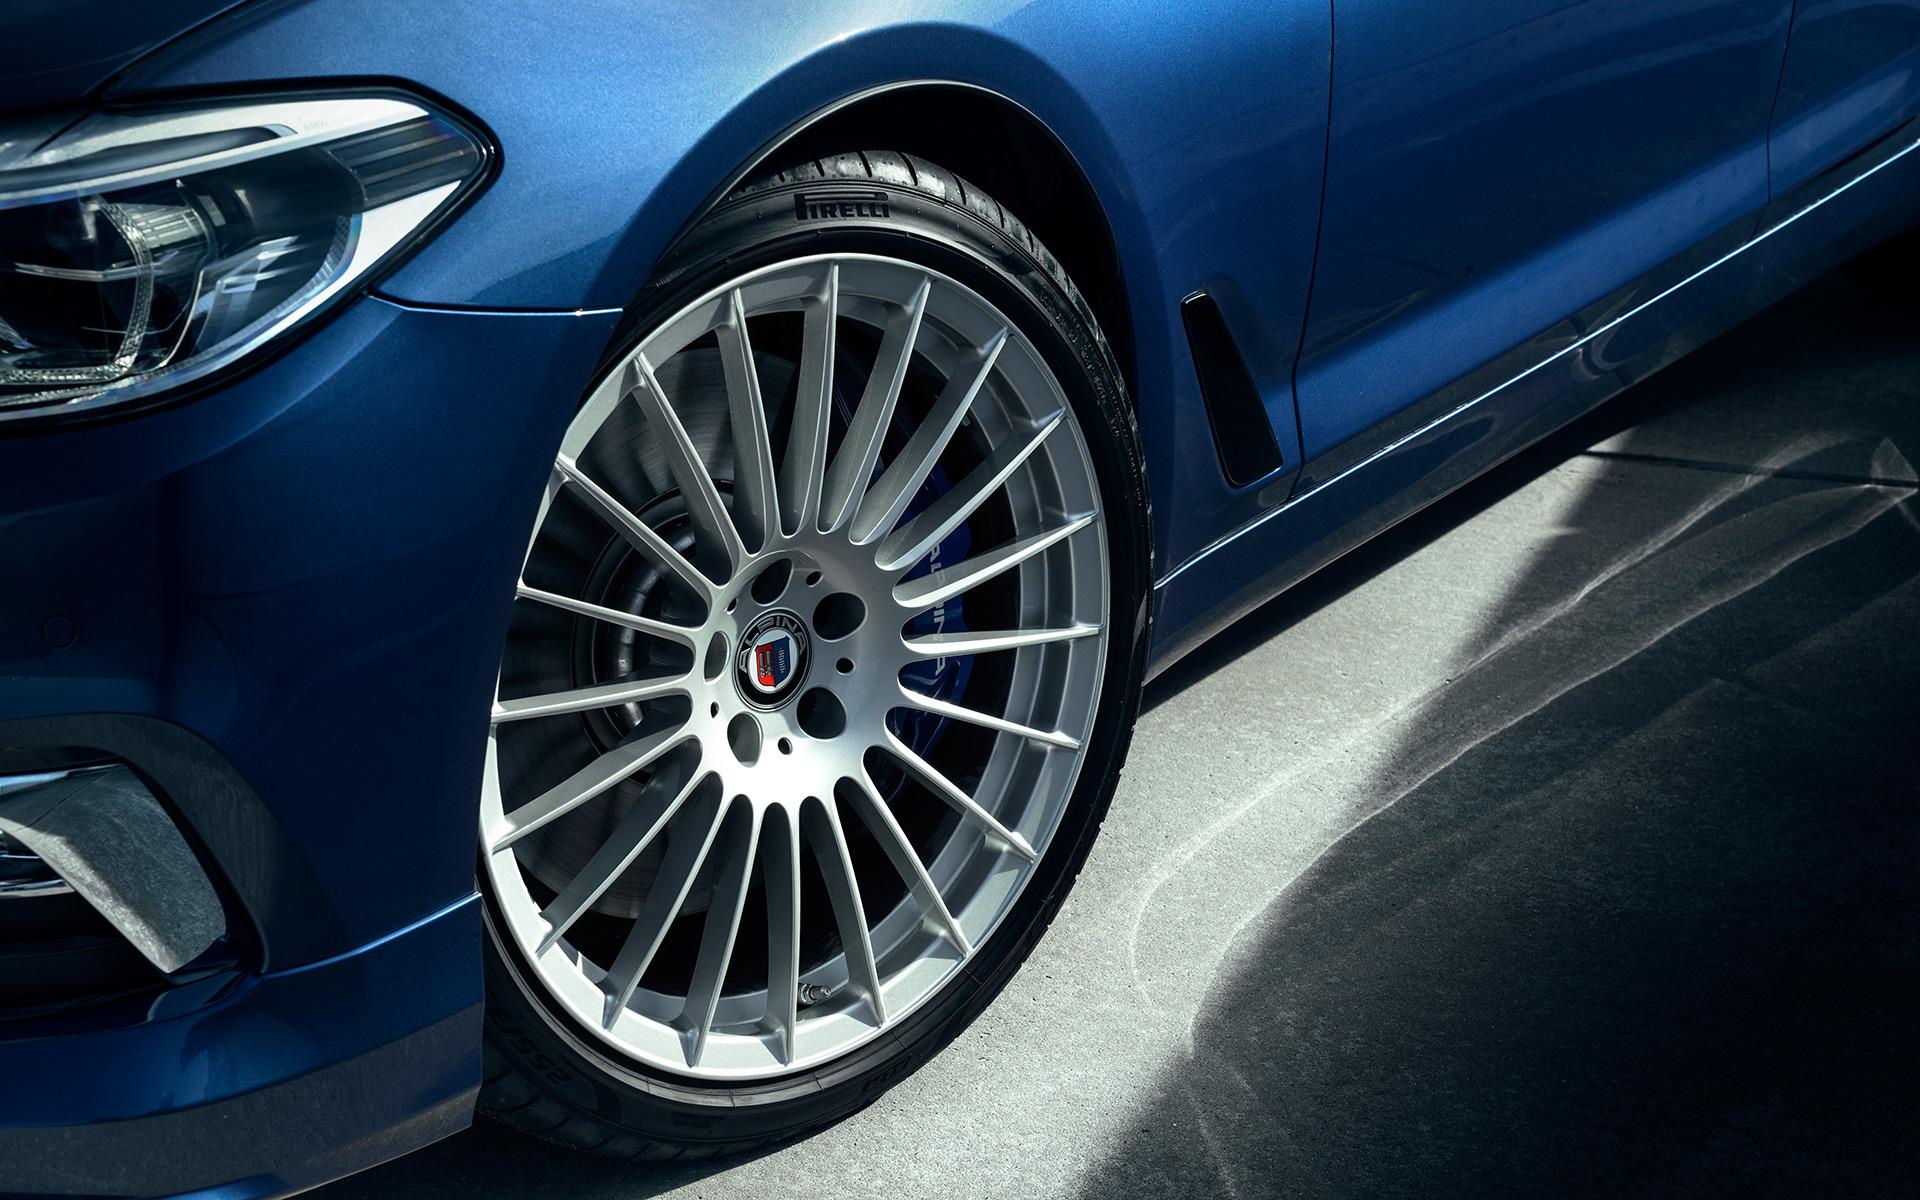 2017 07 BMW ALPINA B5 BITURBO 03